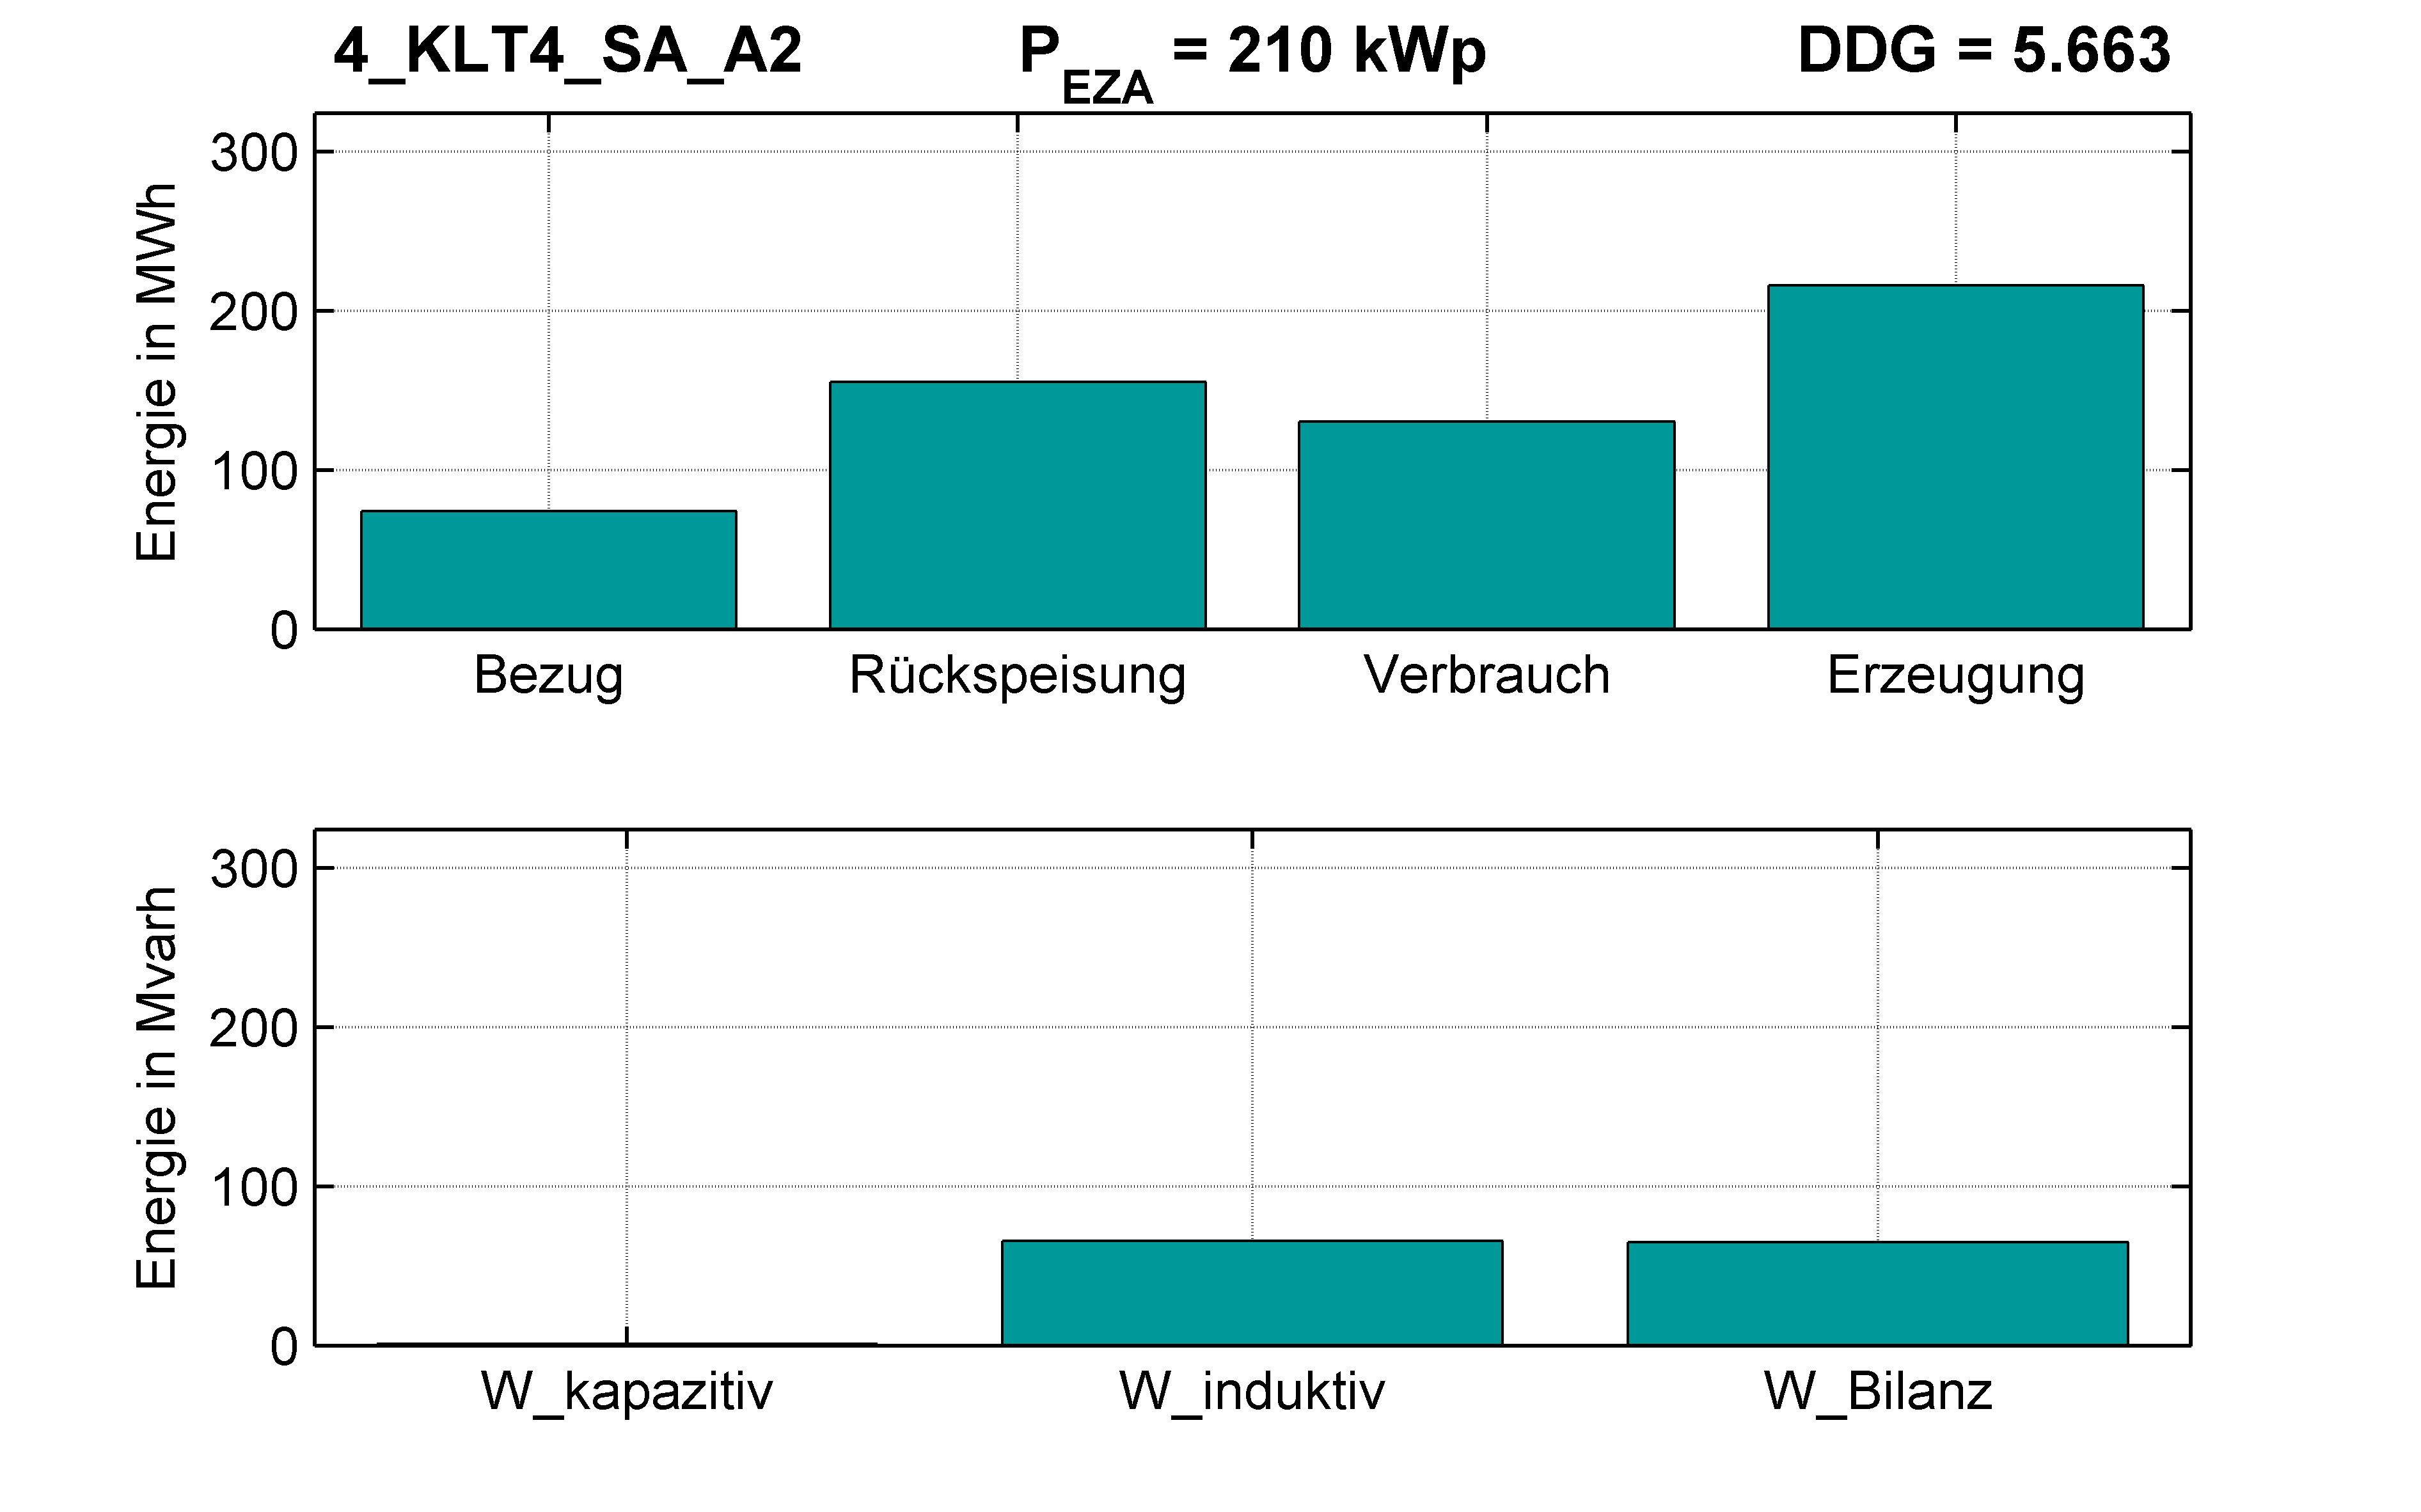 KLT4 | P-Kappung 55% (SA) A2 | PQ-Bilanz